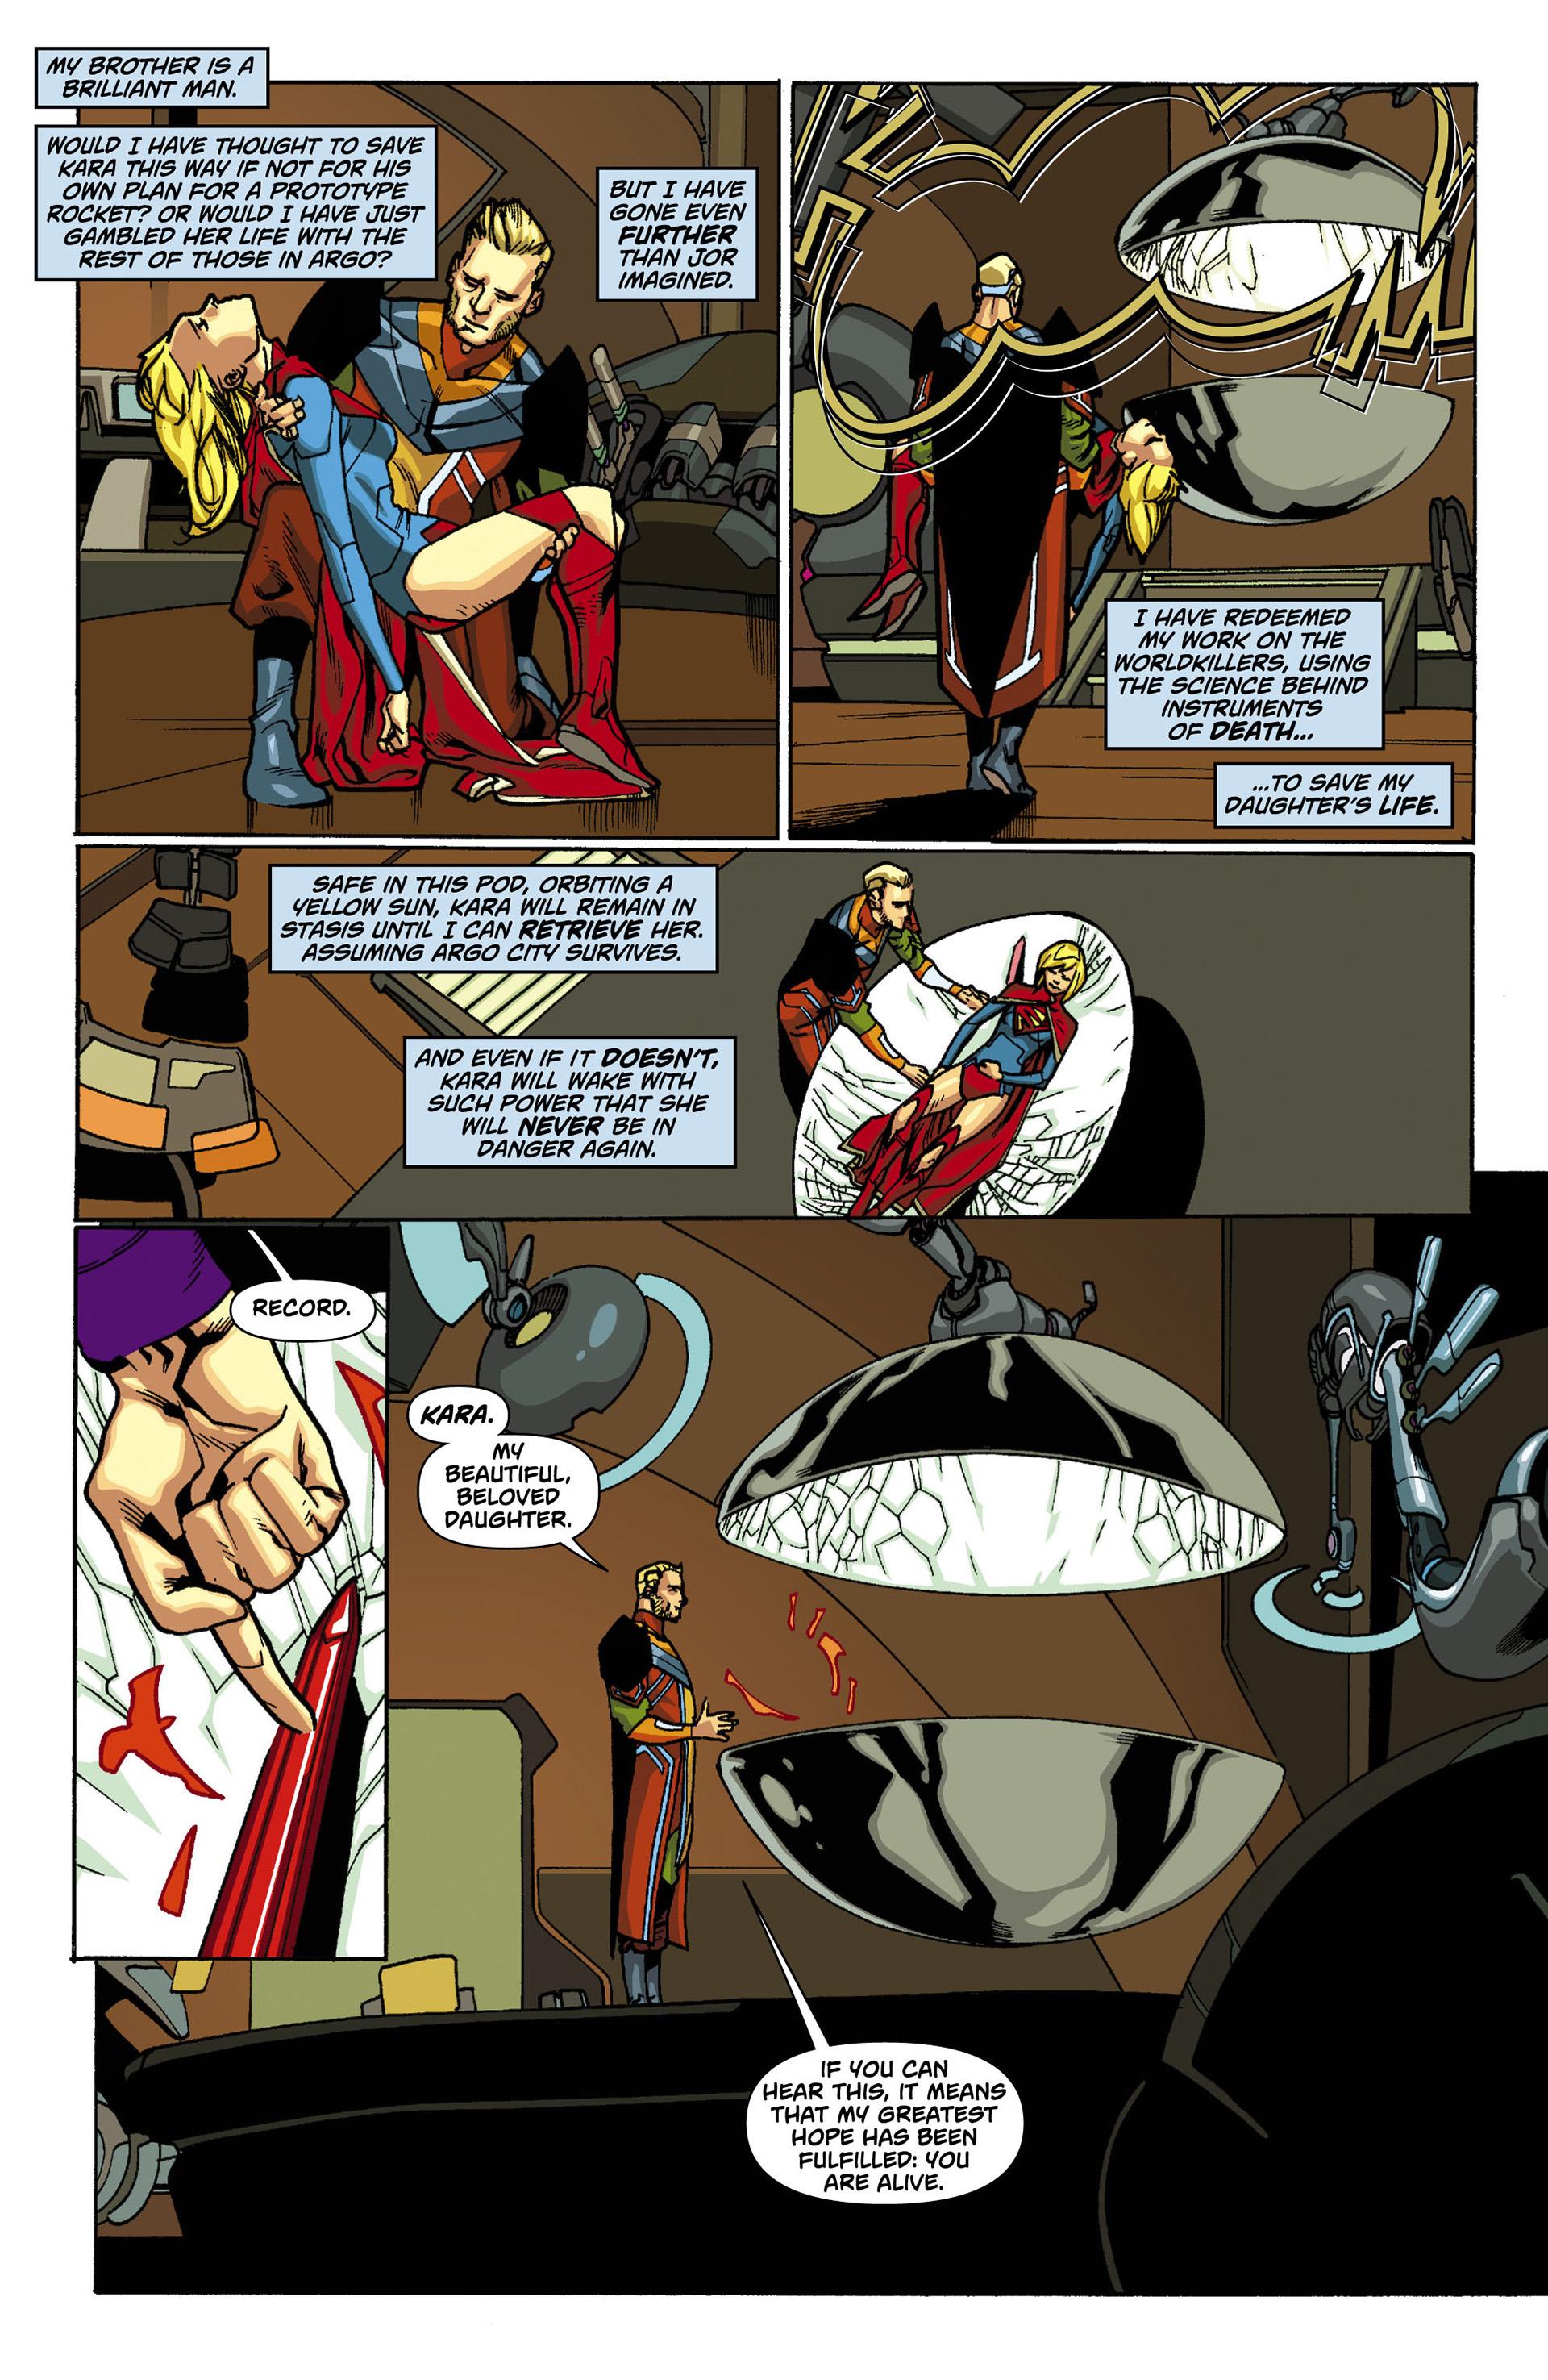 Supergirl (2011) Issue #0 #2 - English 15